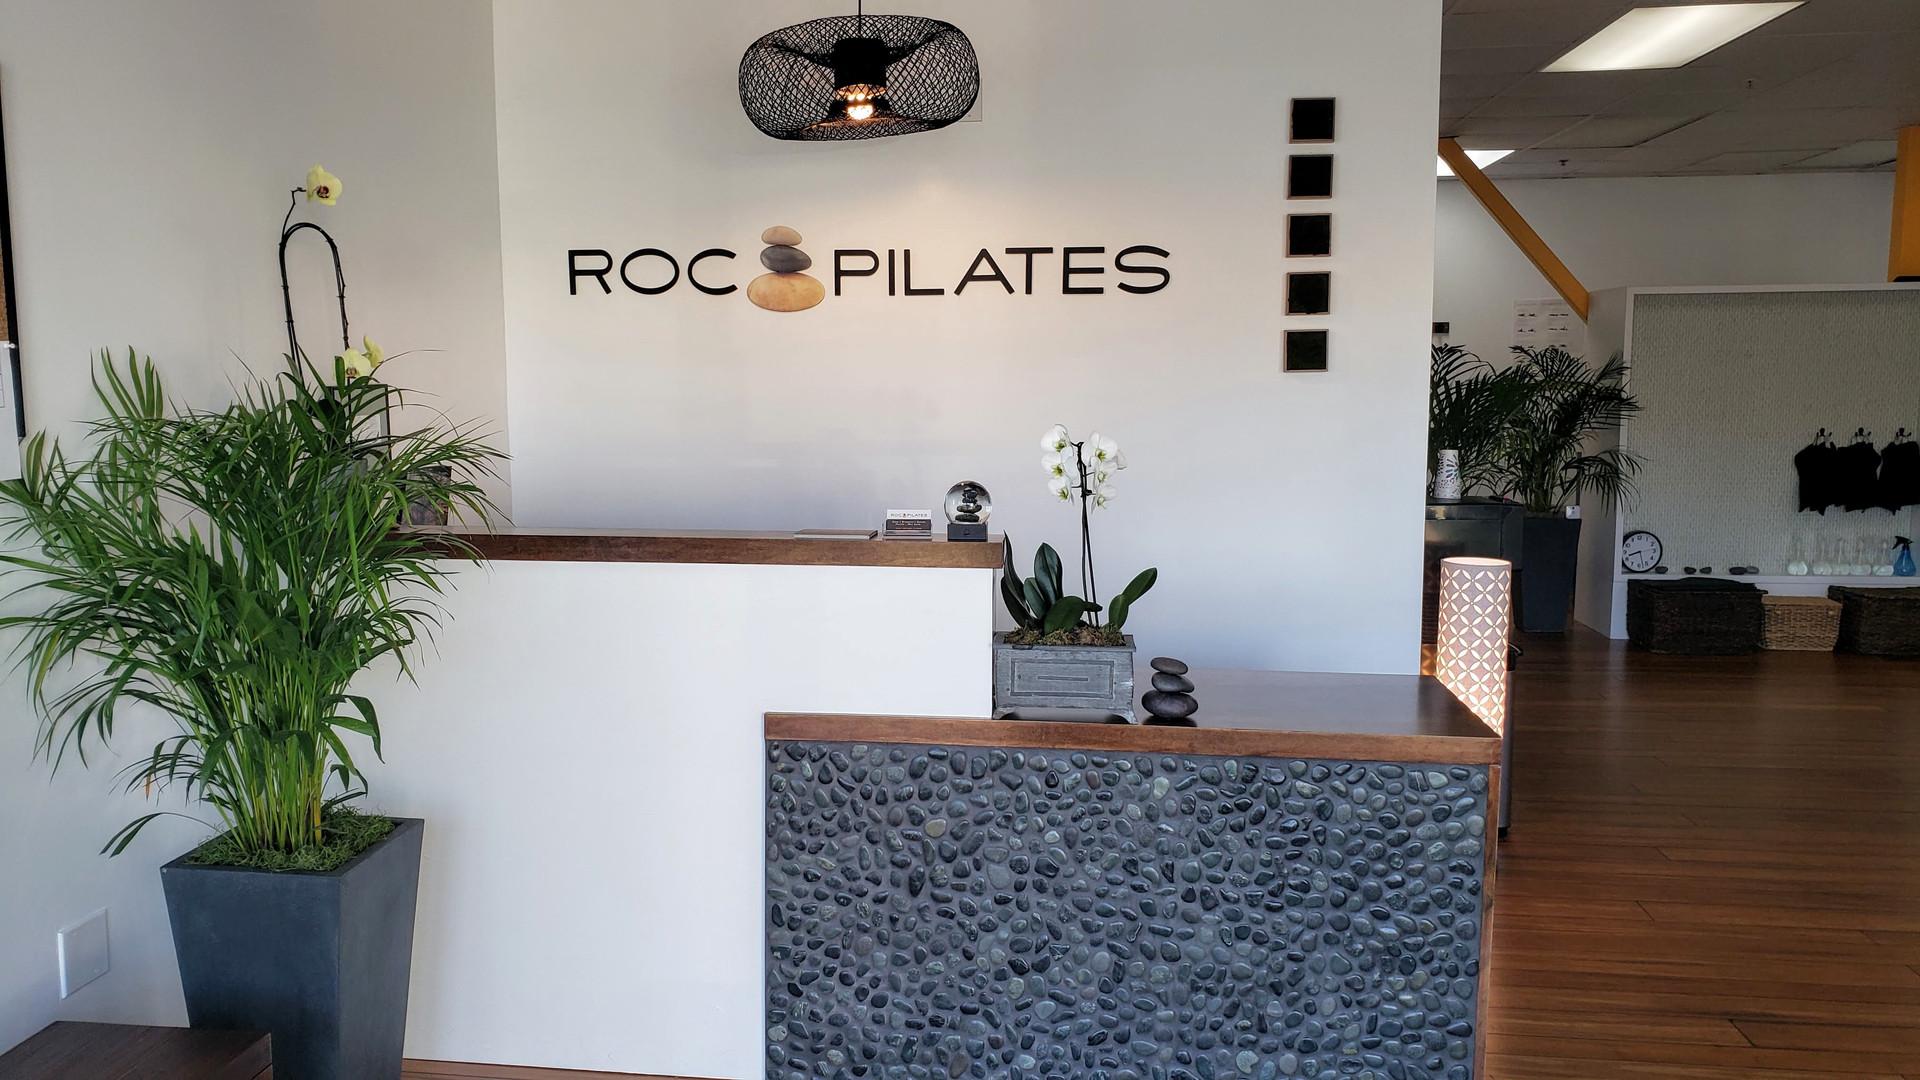 ROC_Pilates_reception.jpg